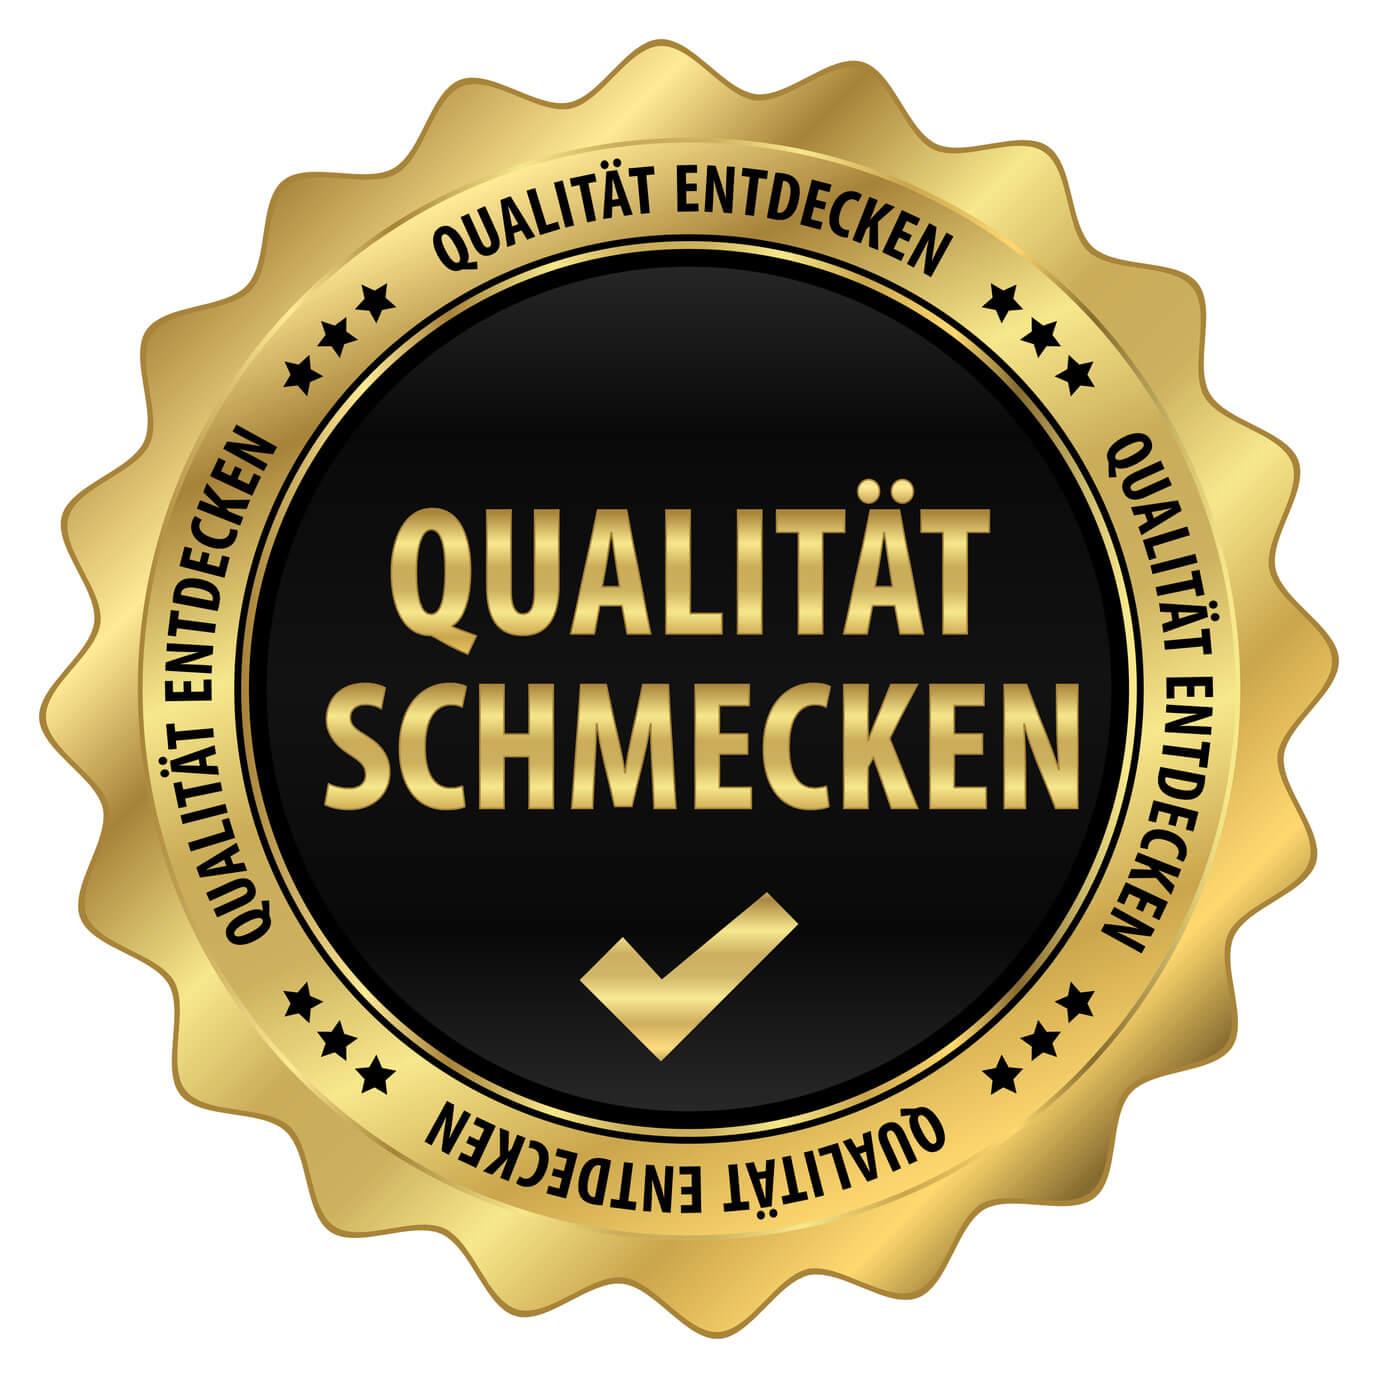 Qualitat_schmecken